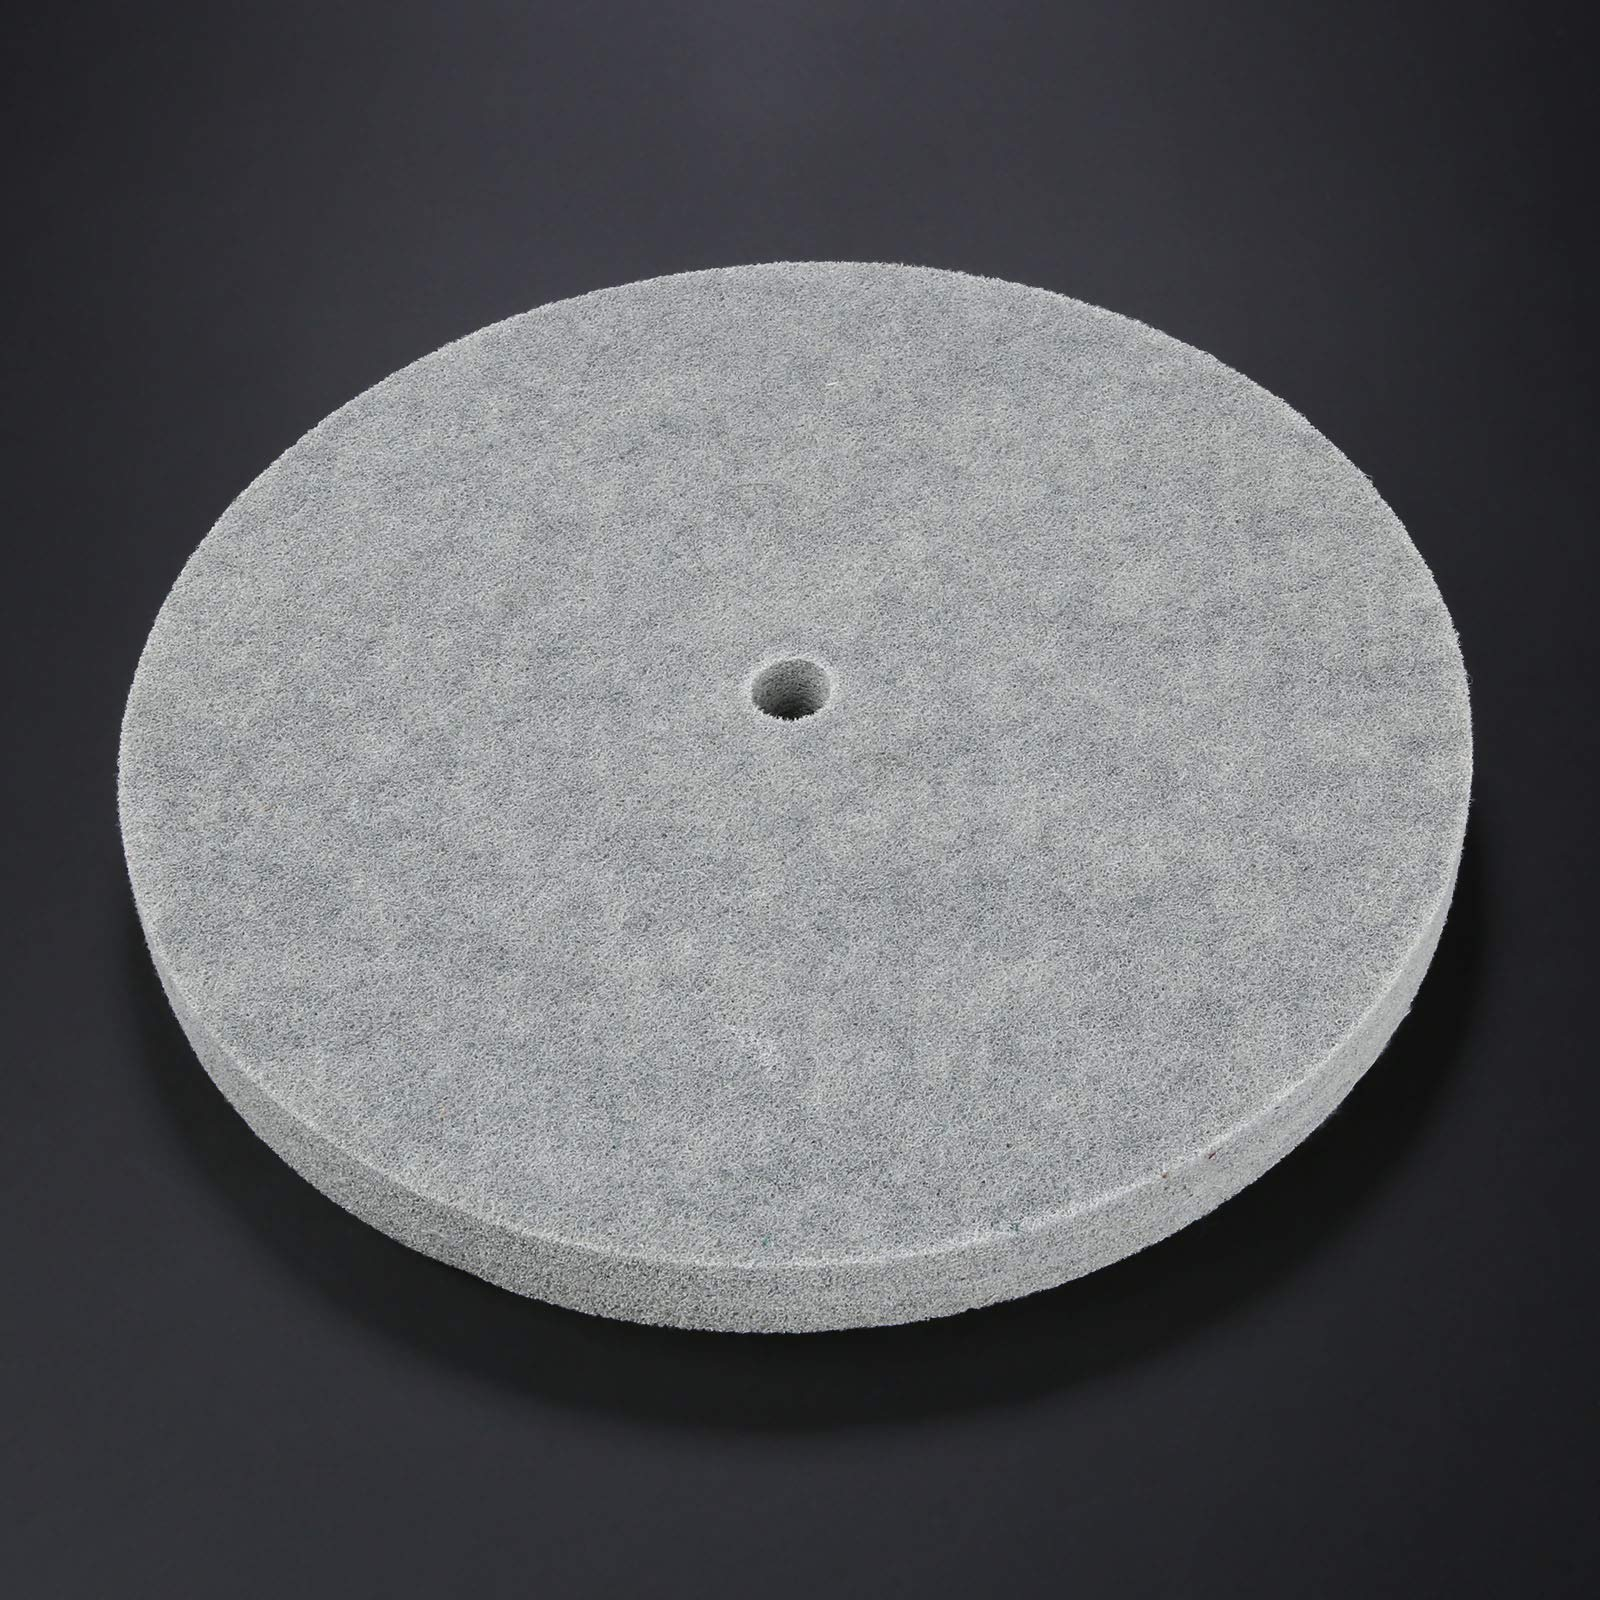 1 PC Thickness Nylon Fiber Polishing Wheel Non-Woven Unitized Wheel 5P 180#, 300MM by Yetaha (Image #4)